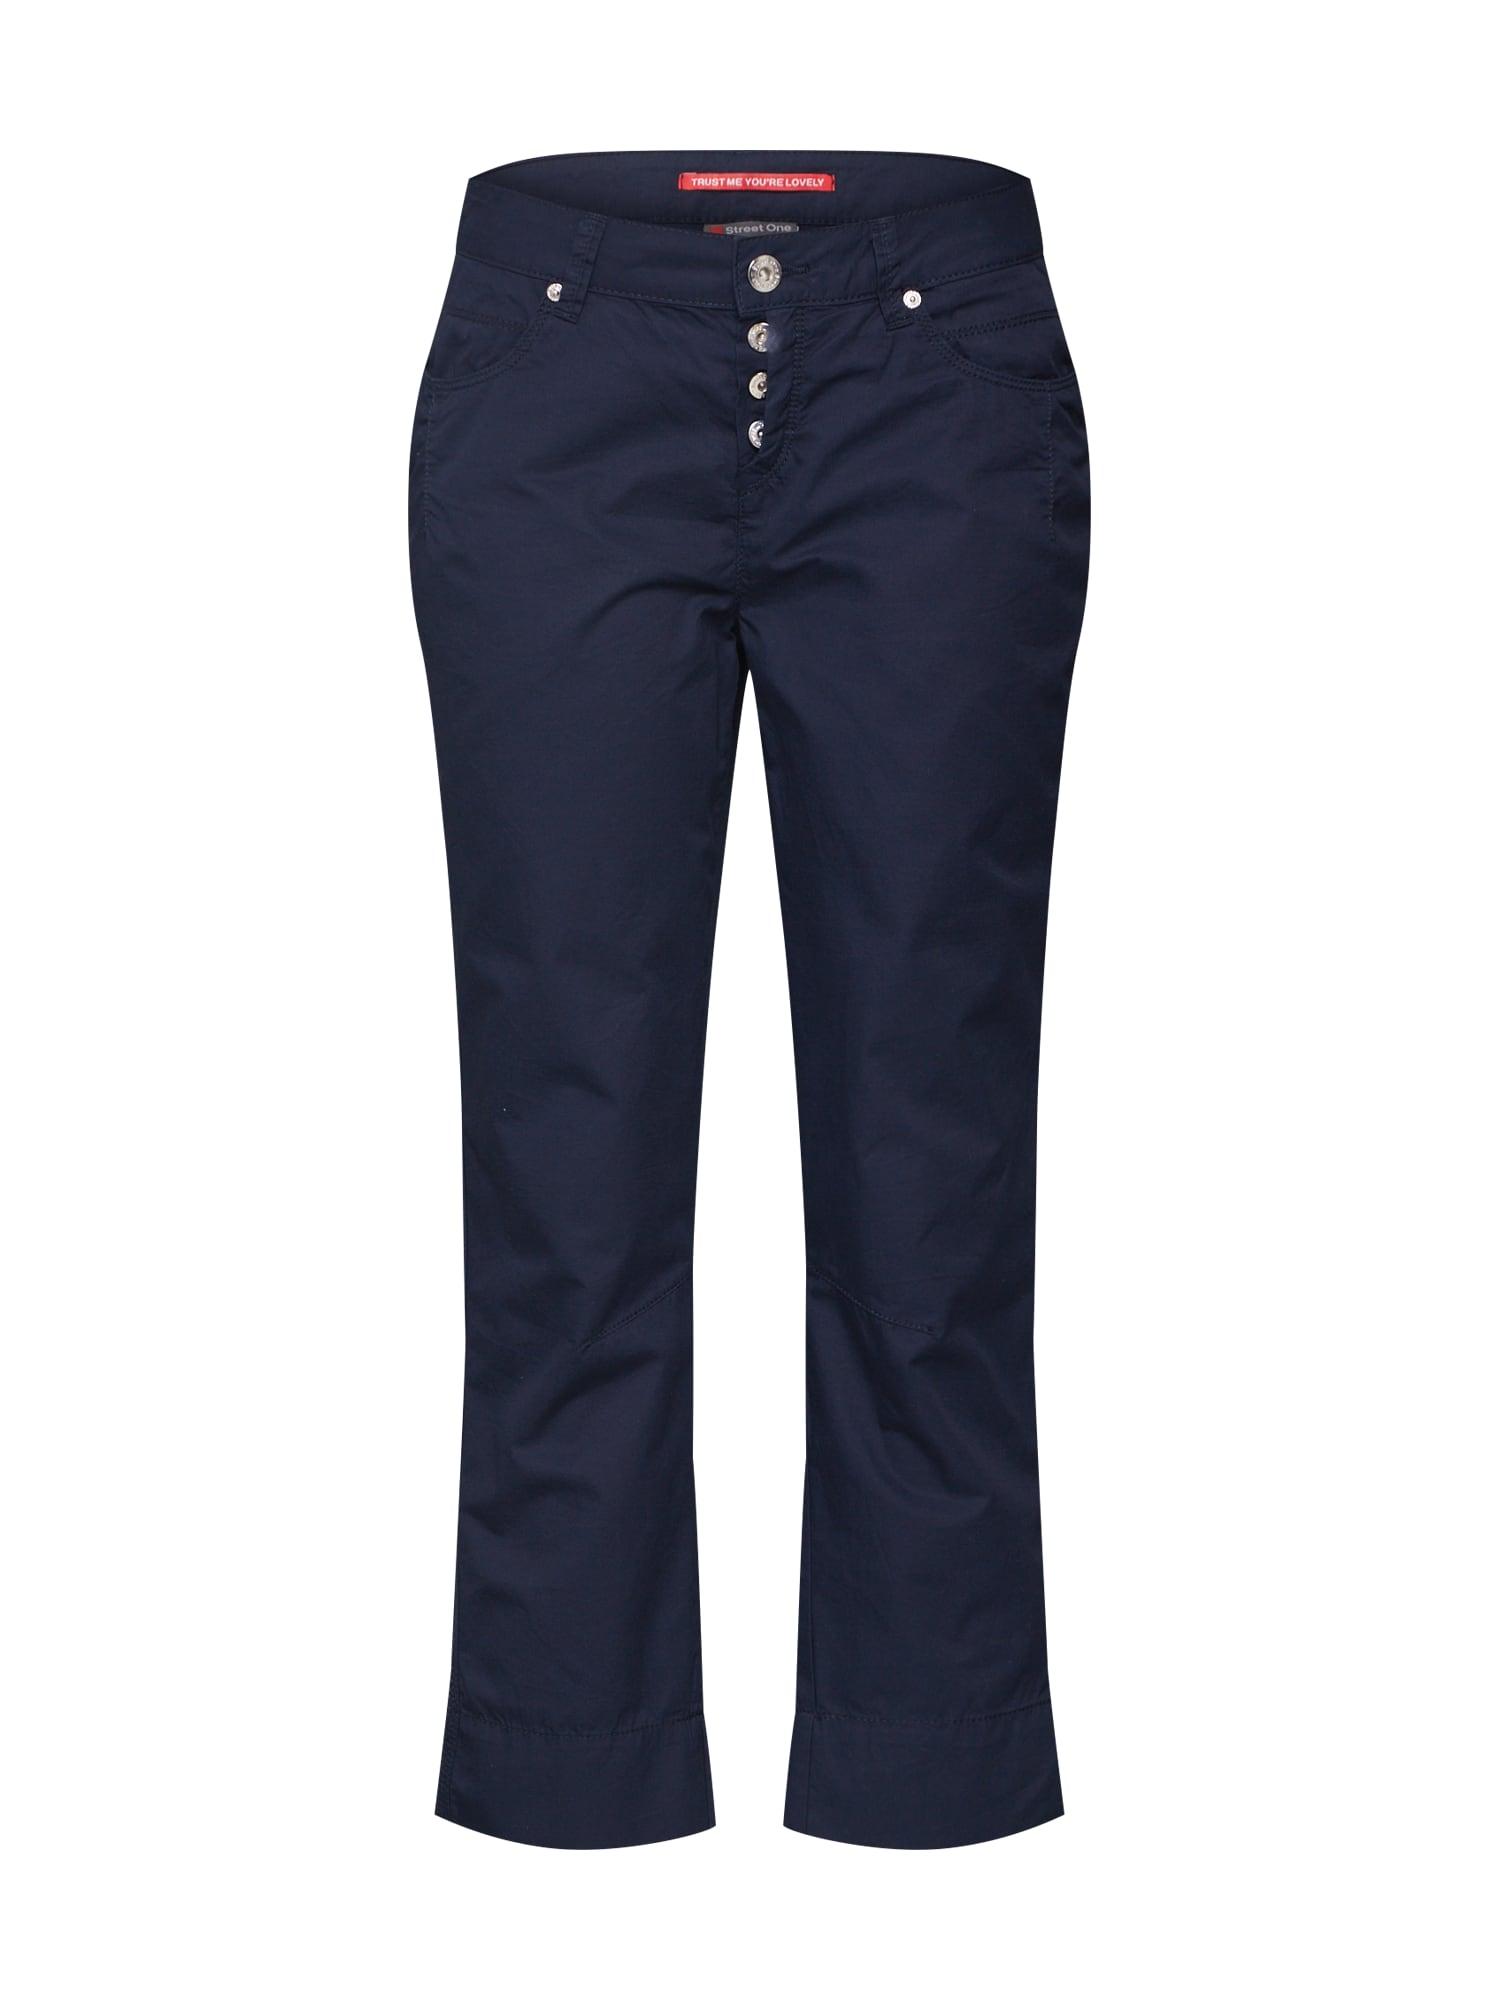 STREET ONE Kalhoty 'Jane L26 Papertouch MW Casual'  tmavě modrá